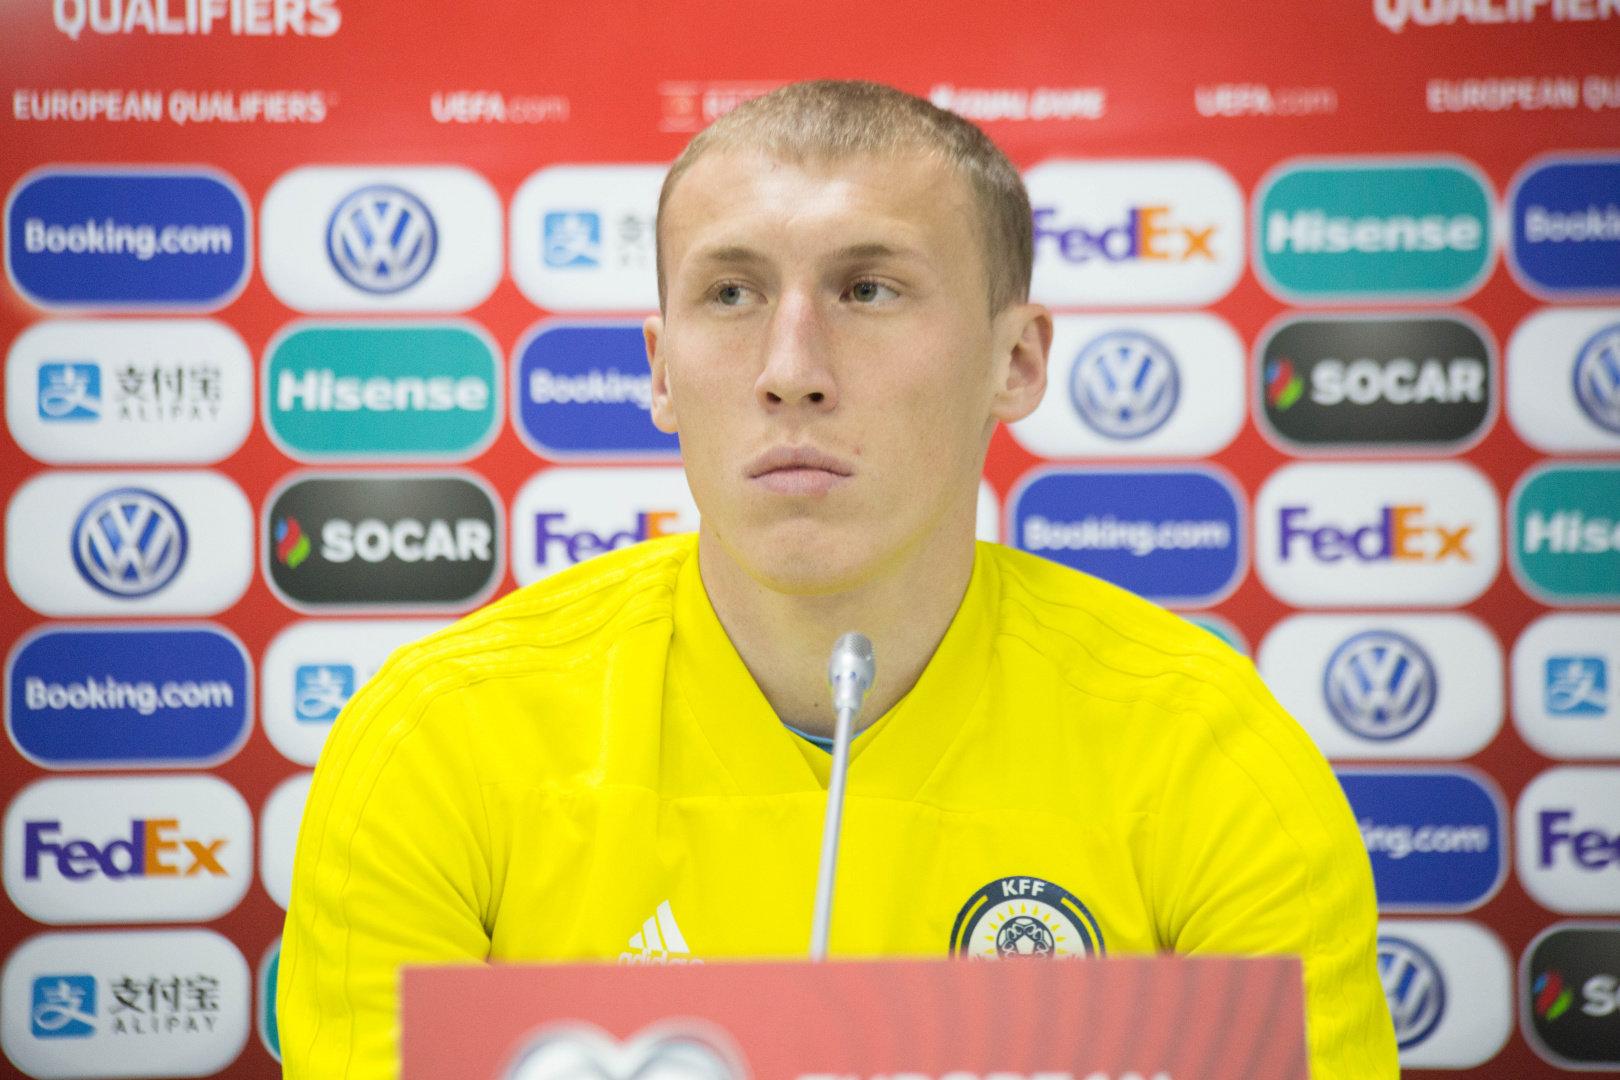 Transfermarkt: Игрок сборной Казахстана Куат заявлен за «Химки»